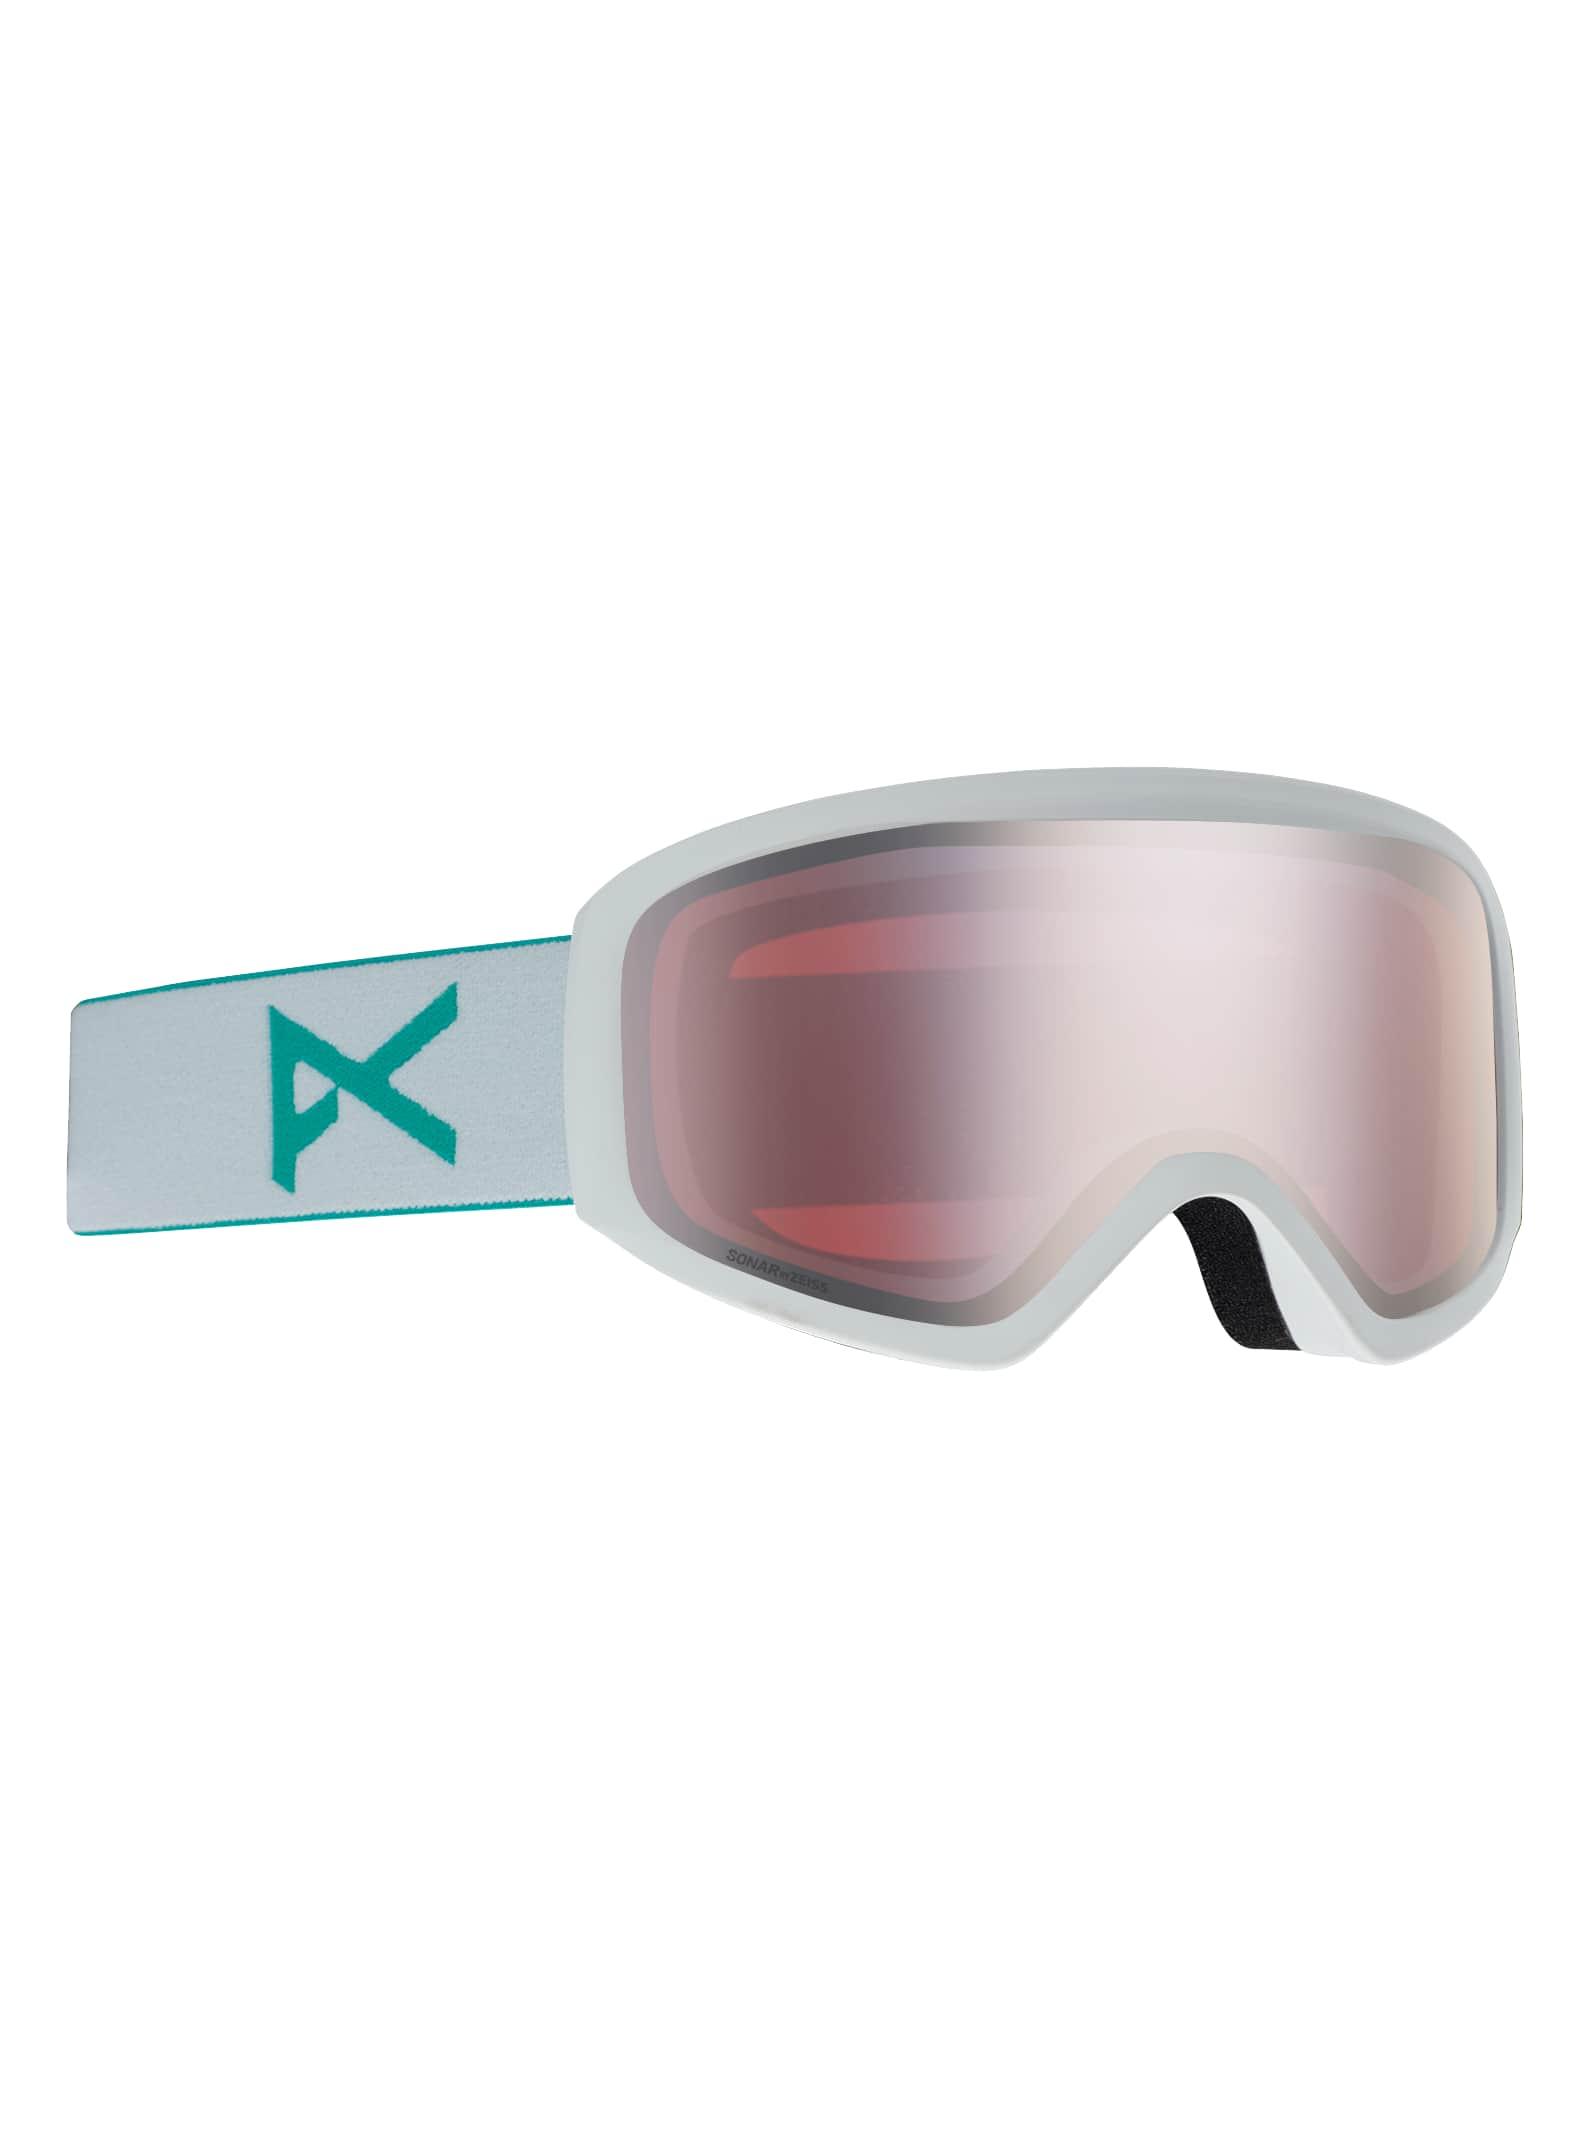 Anon Insight Sonar skidglasögon + reservlins för damer, Frame: White, Lens: SONAR Silver, Spare Lens: Amber